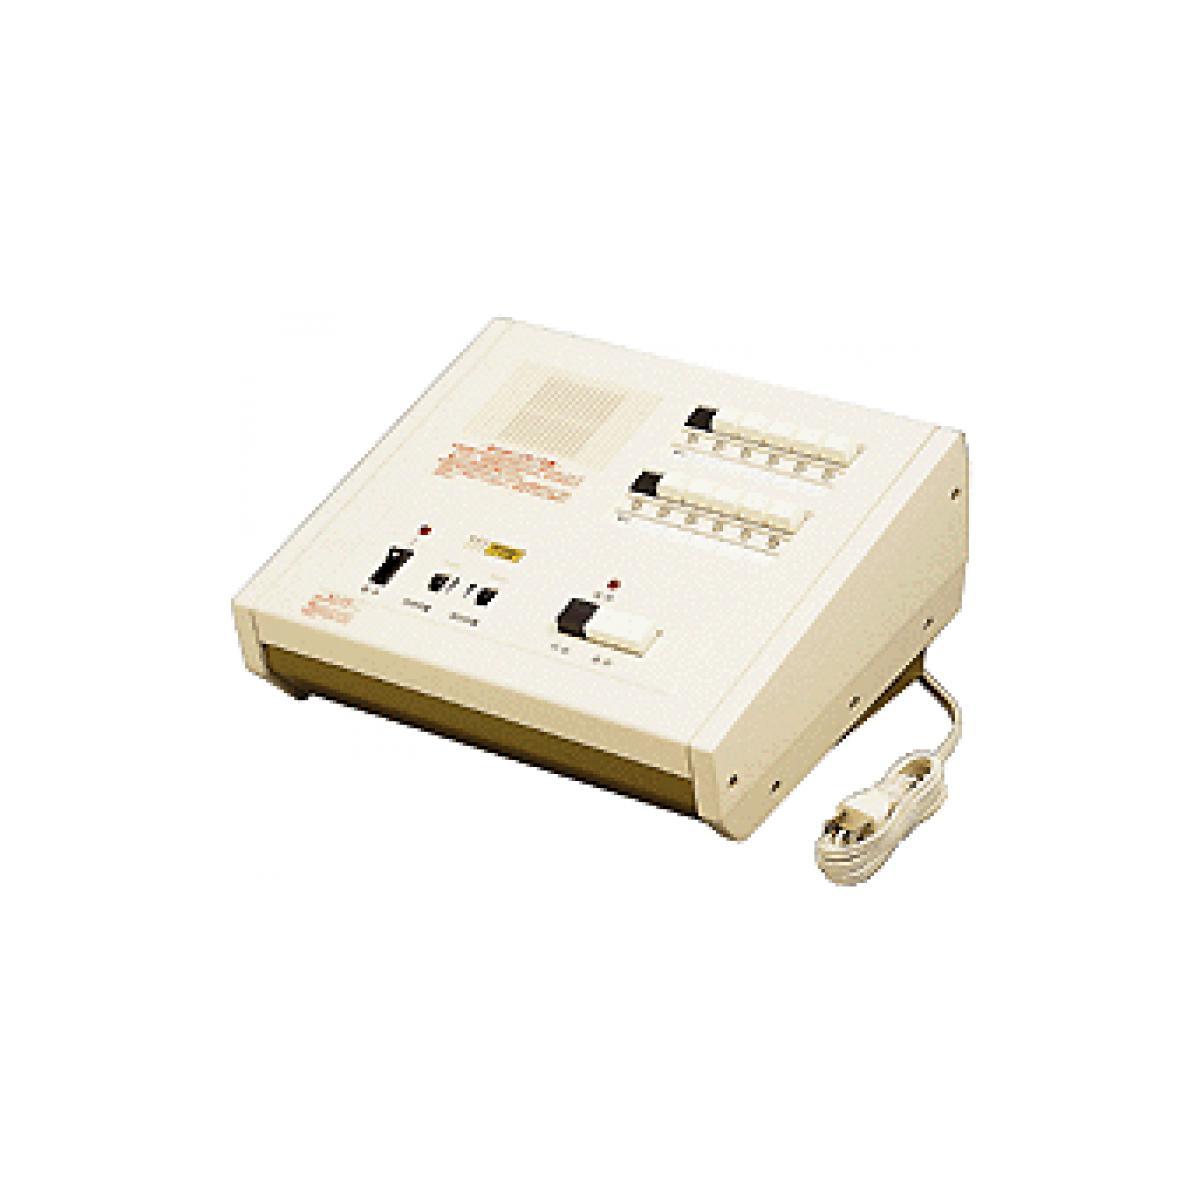 nutone intercom wiring diagrams redman mobile home wiring